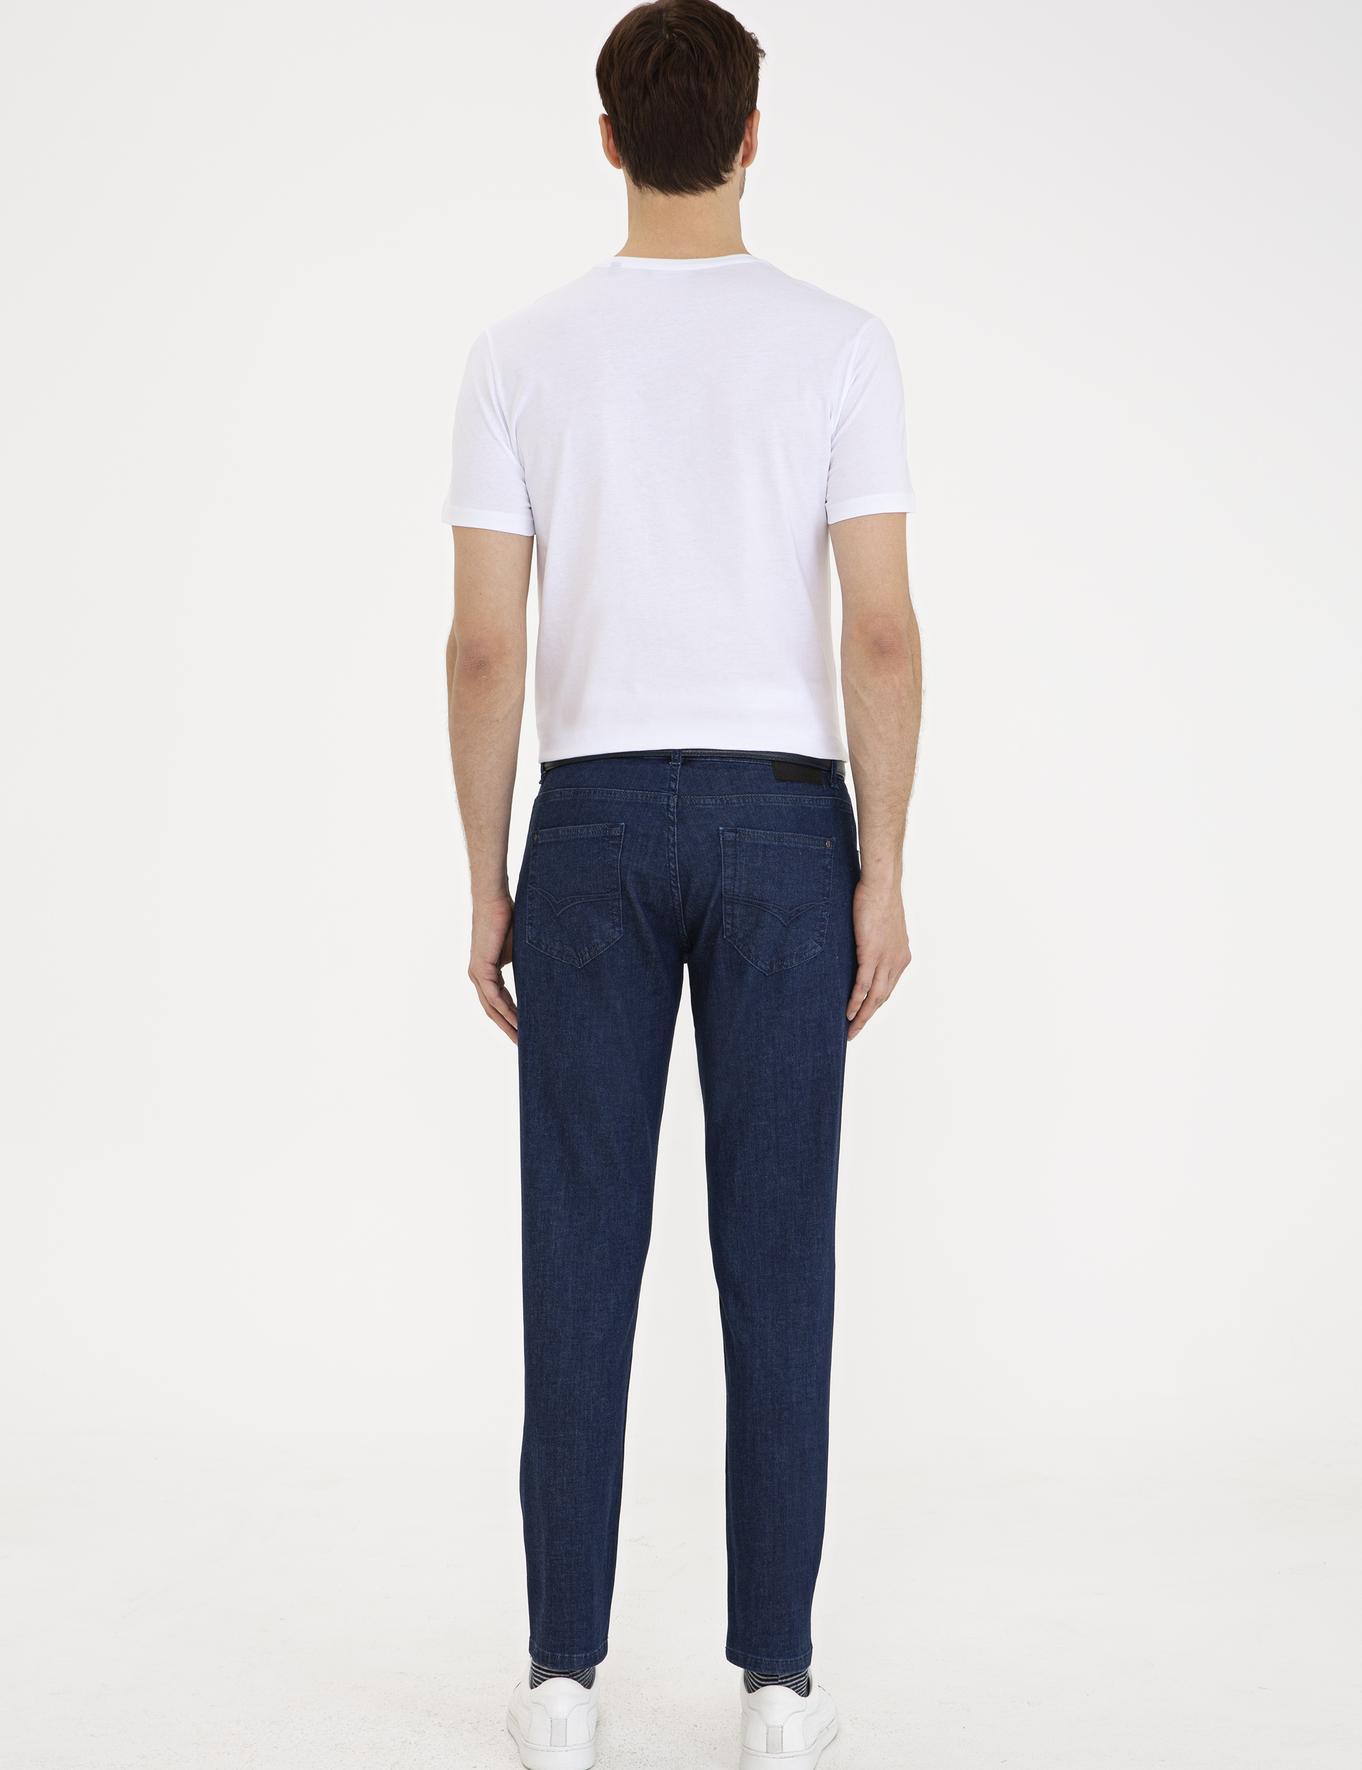 Mavi Slim Fit Denim - 50232612069